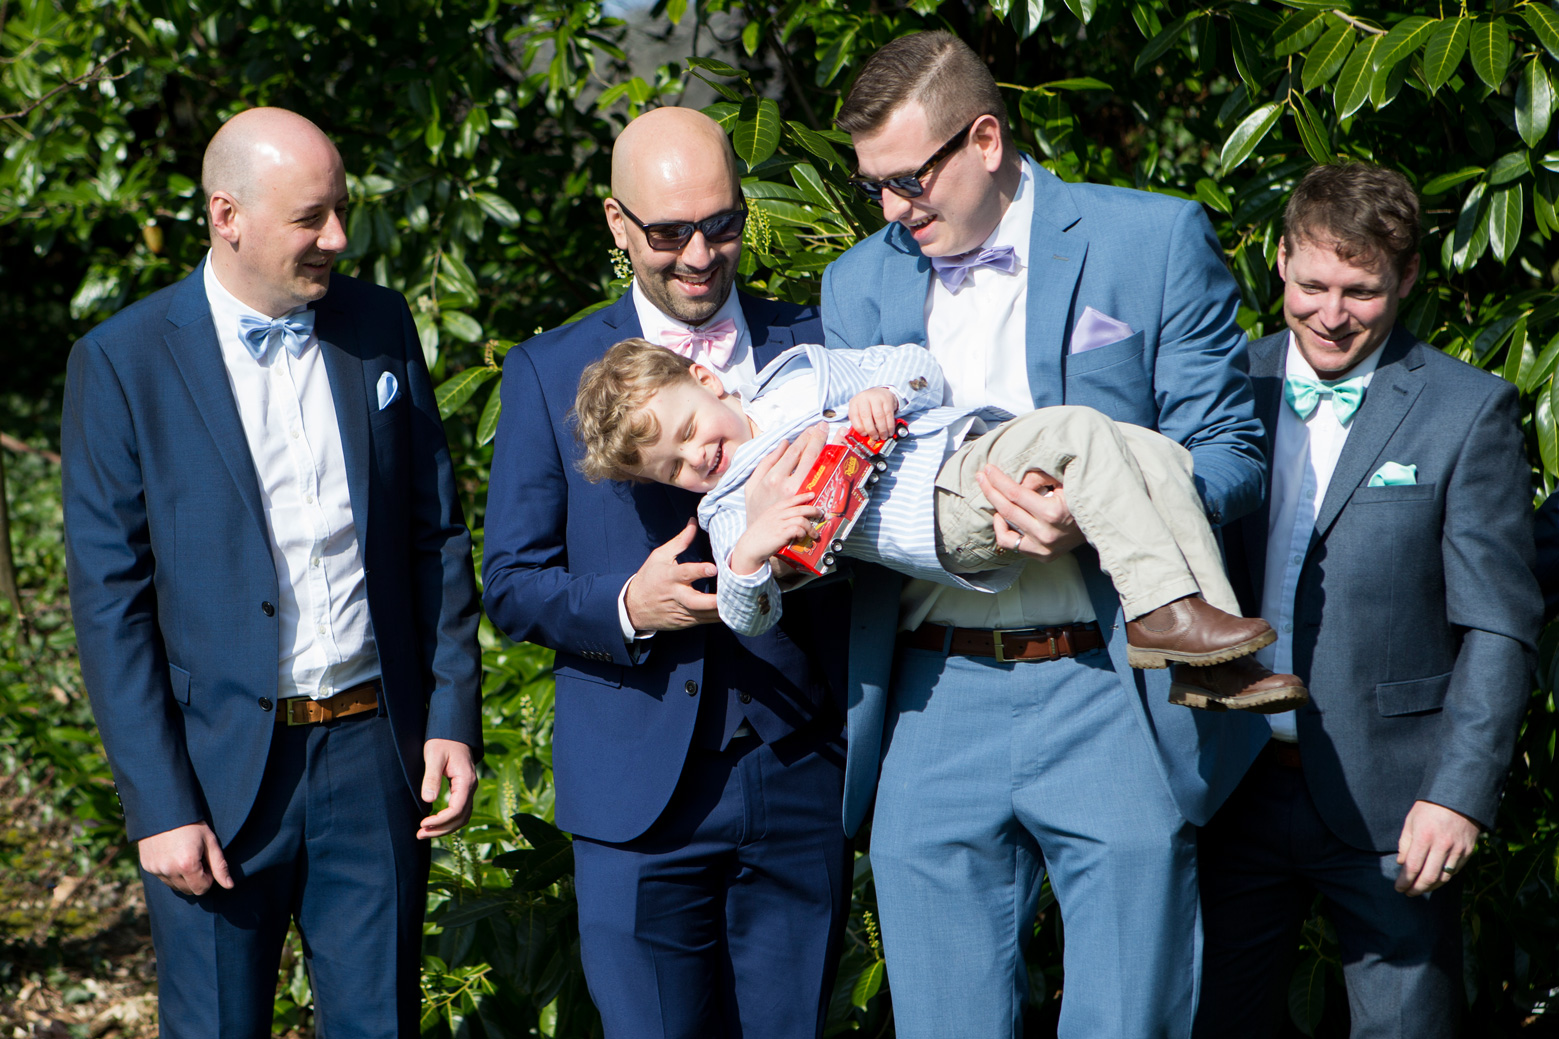 Fun groomsmen portrait wedding